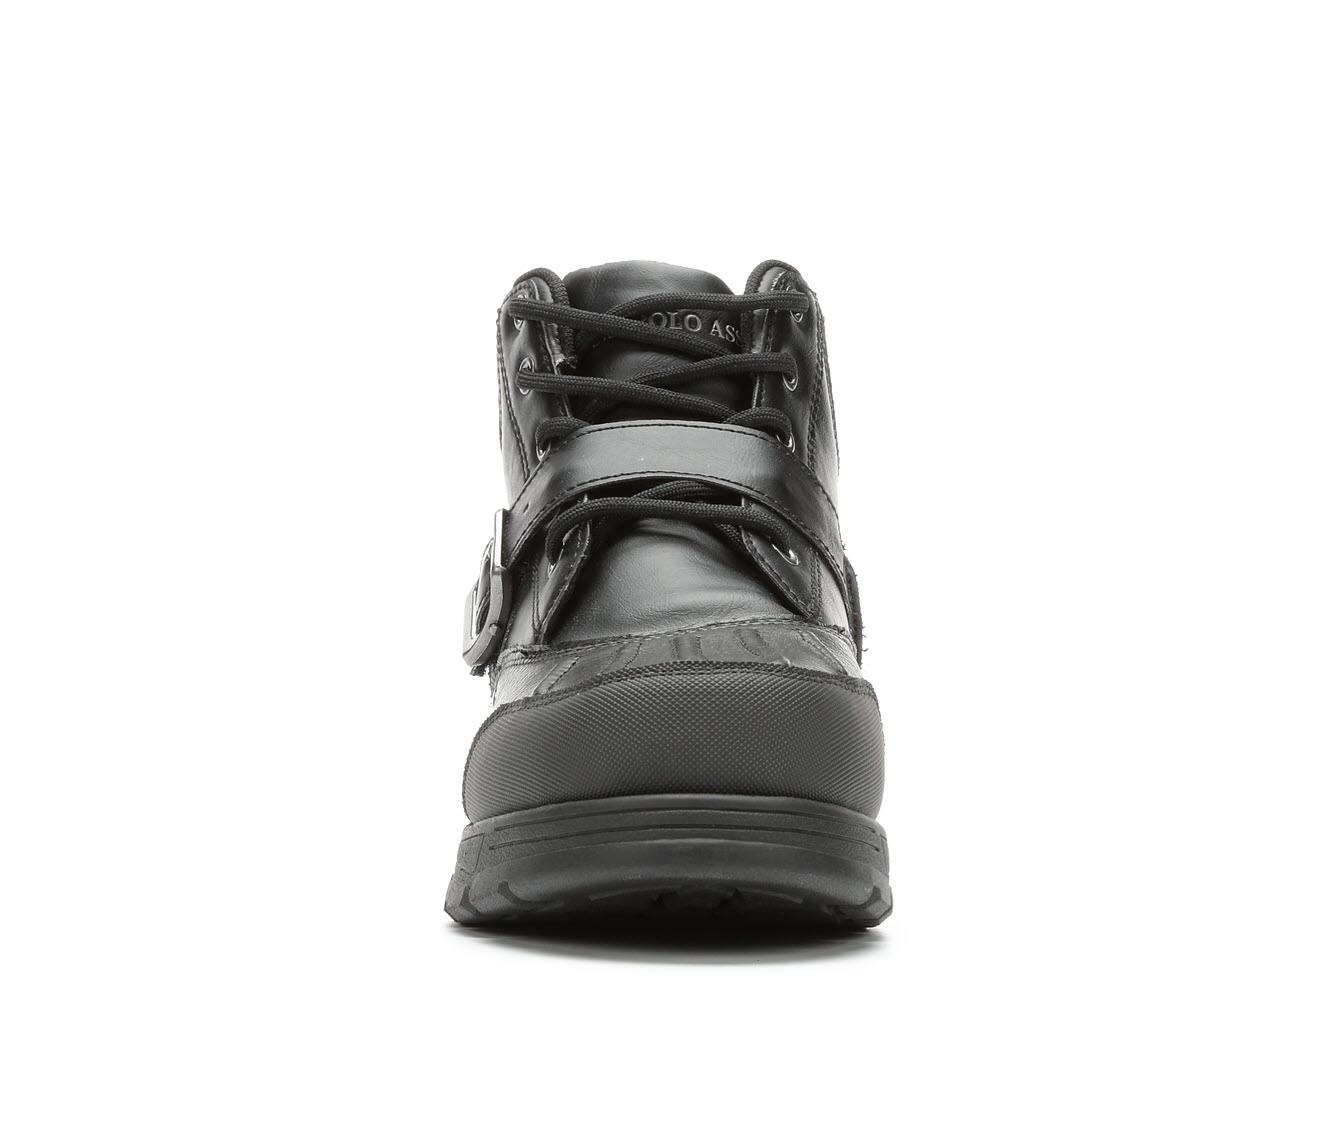 Men's US Polo Assn Kedge Lace-Up Boots